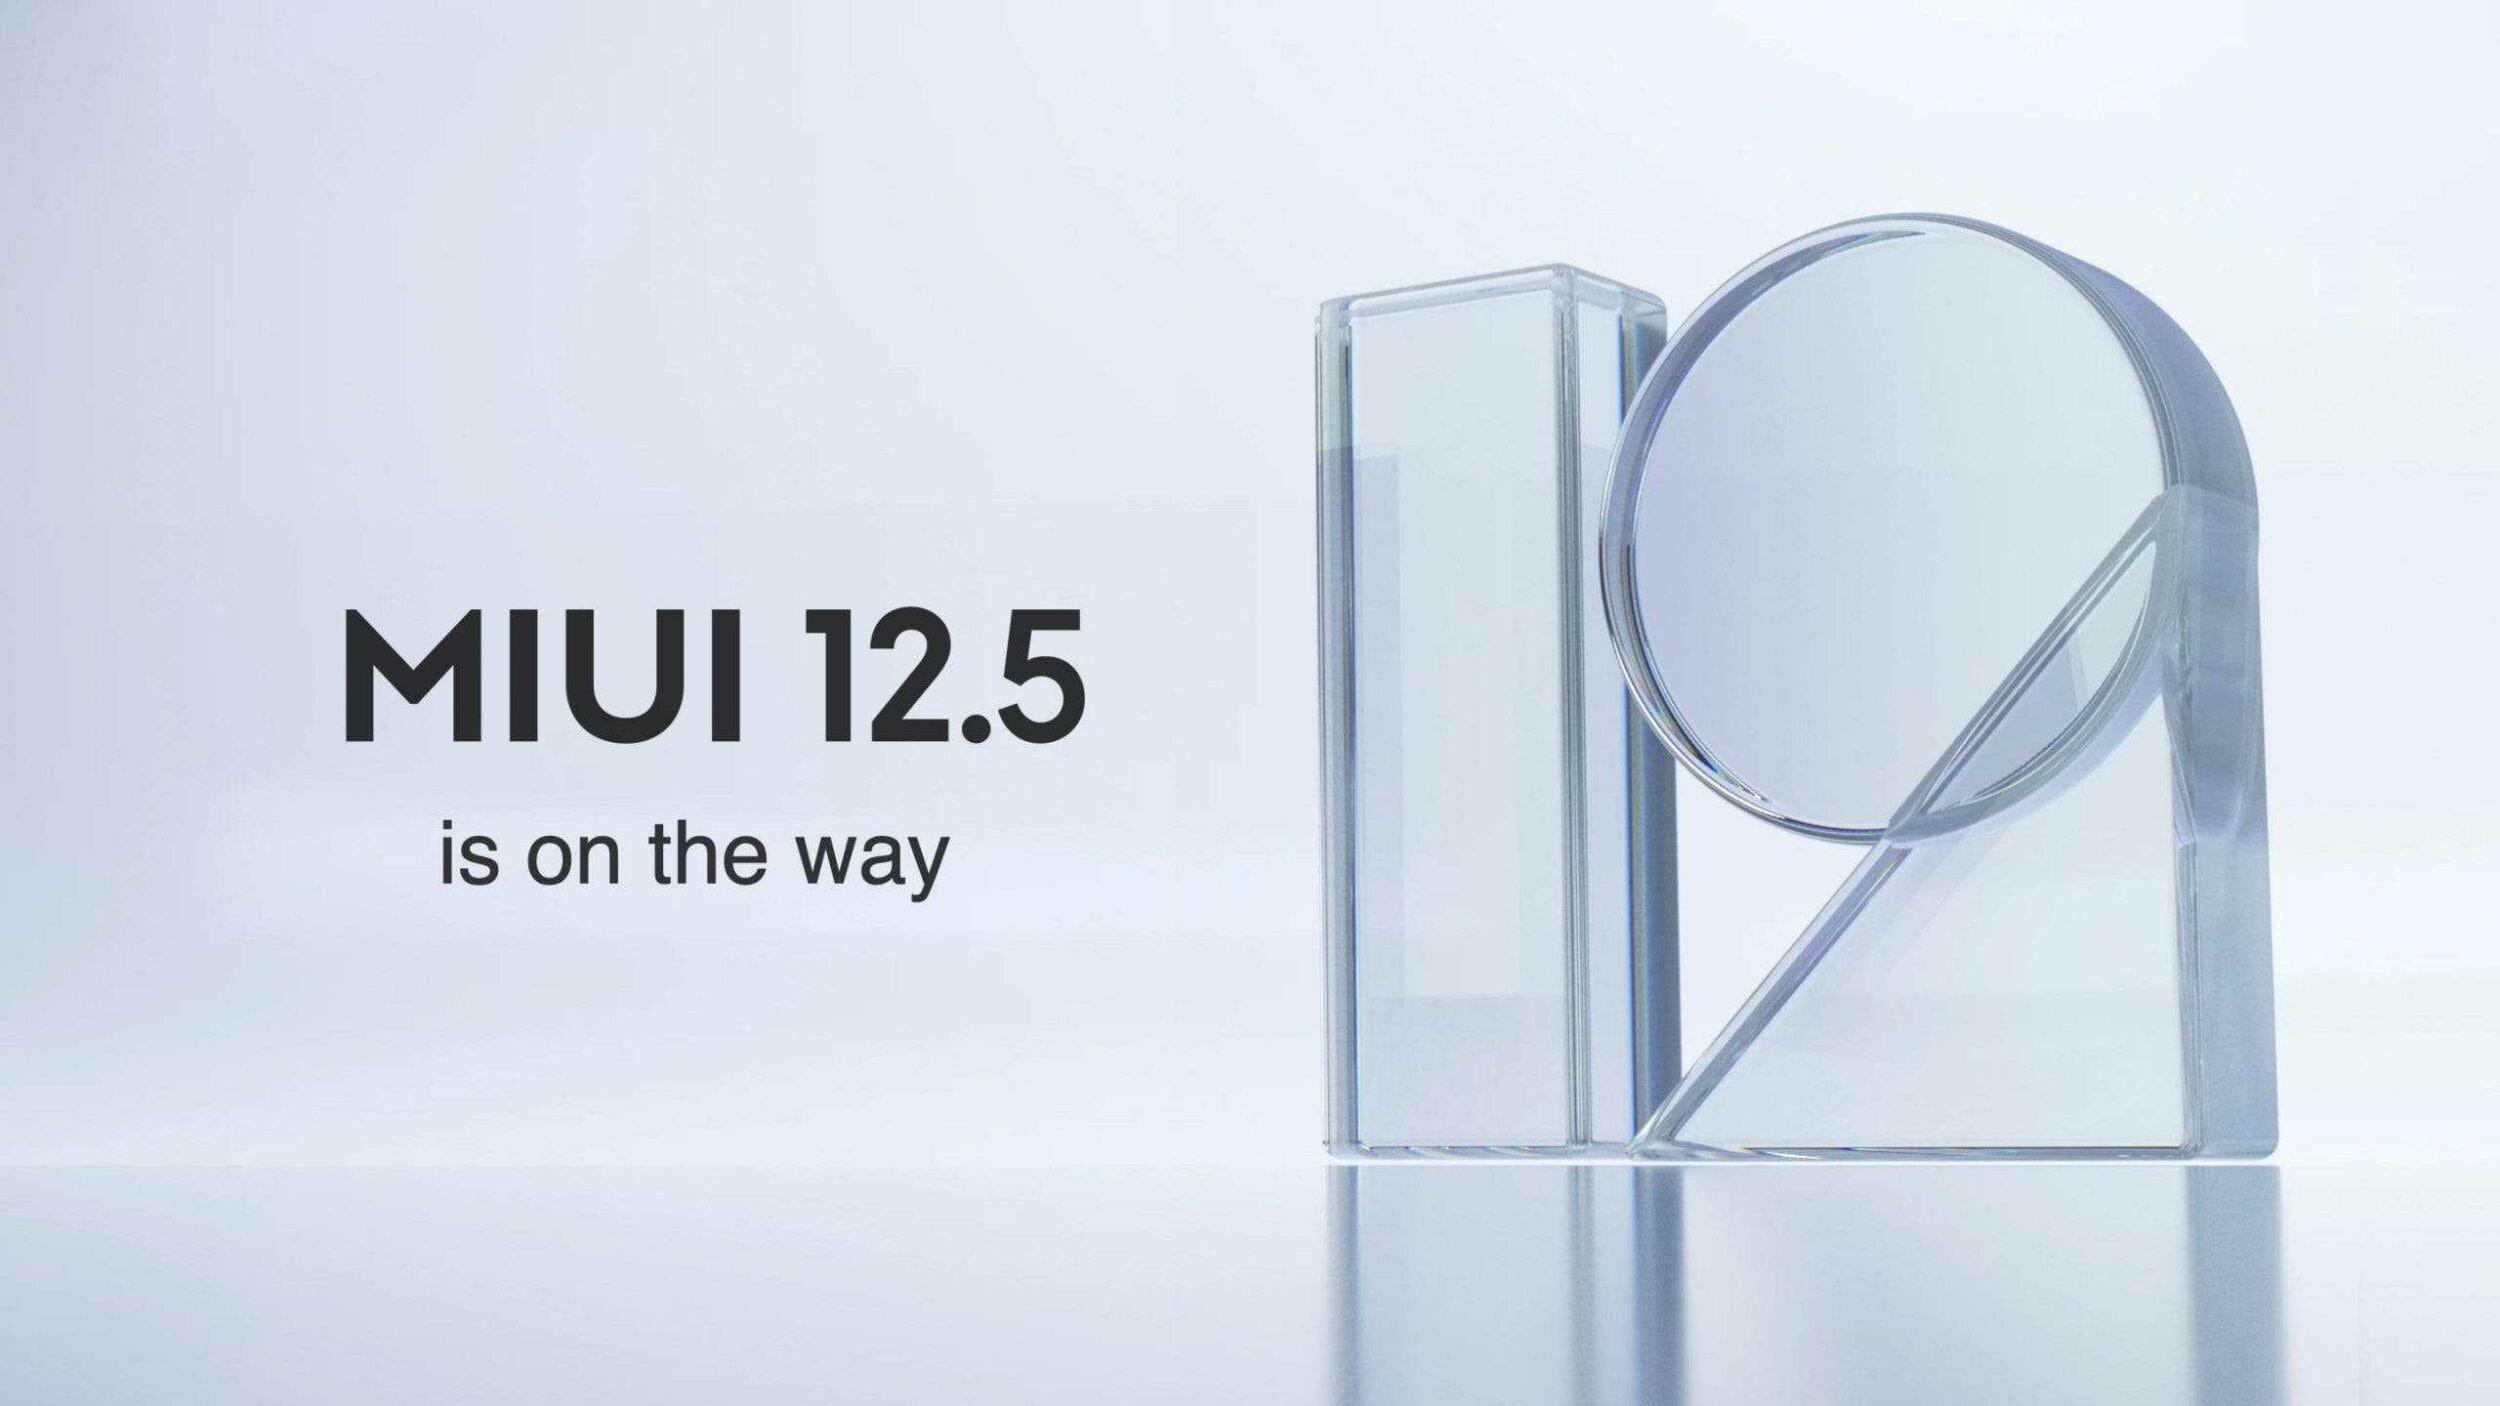 Ecco quali smartphone Xiaomi riceveranno l'ultima MIUI 12.5 Enhanced Global